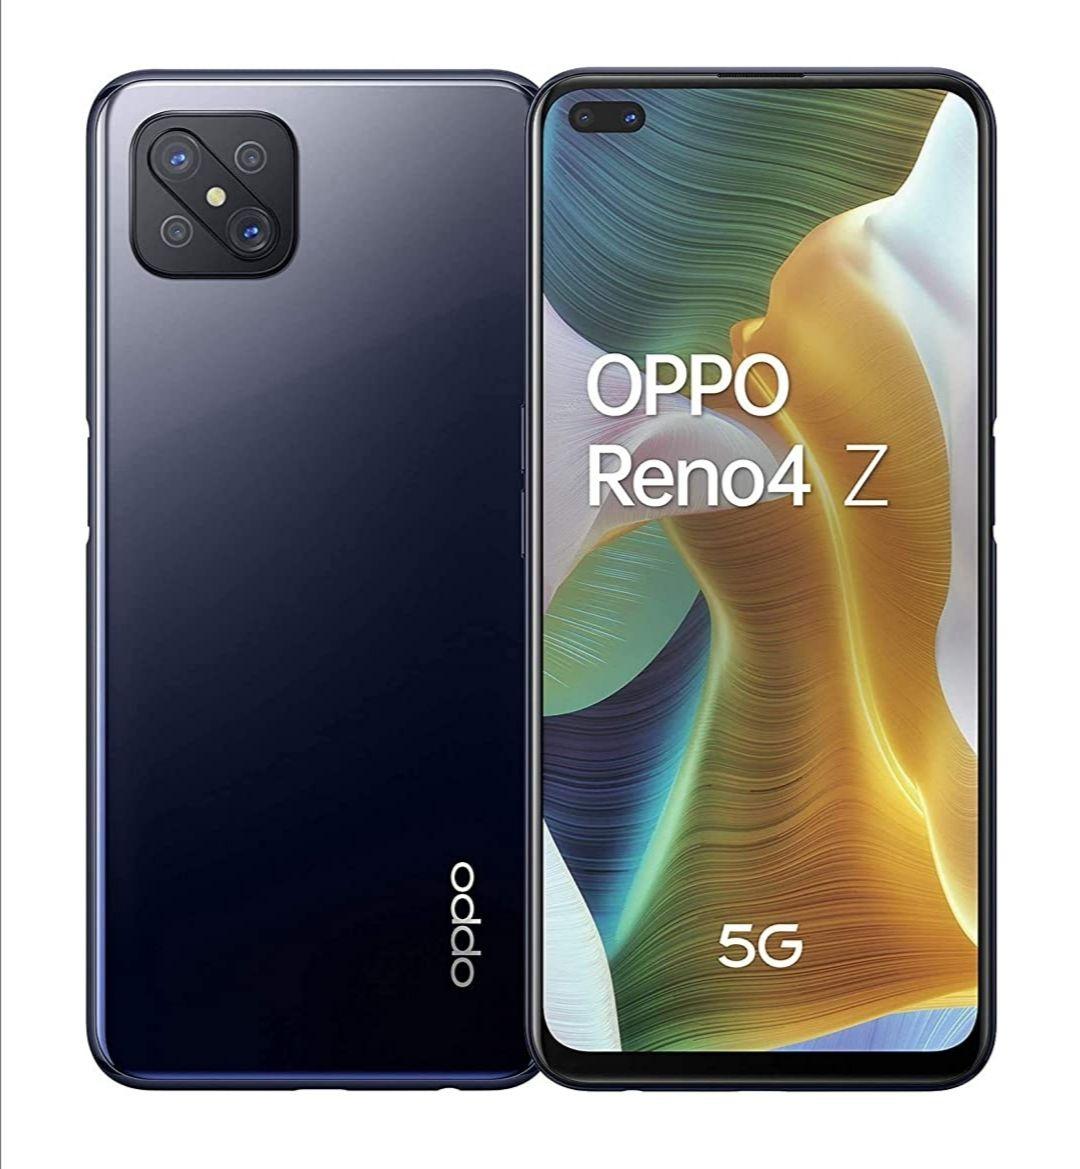 OPPO Reno4 Z 5G Smartphone 8GB 128GB (Dual Sim / 4000mAh / Dimensity 800) - £246.15 Delivered @ BT Shop